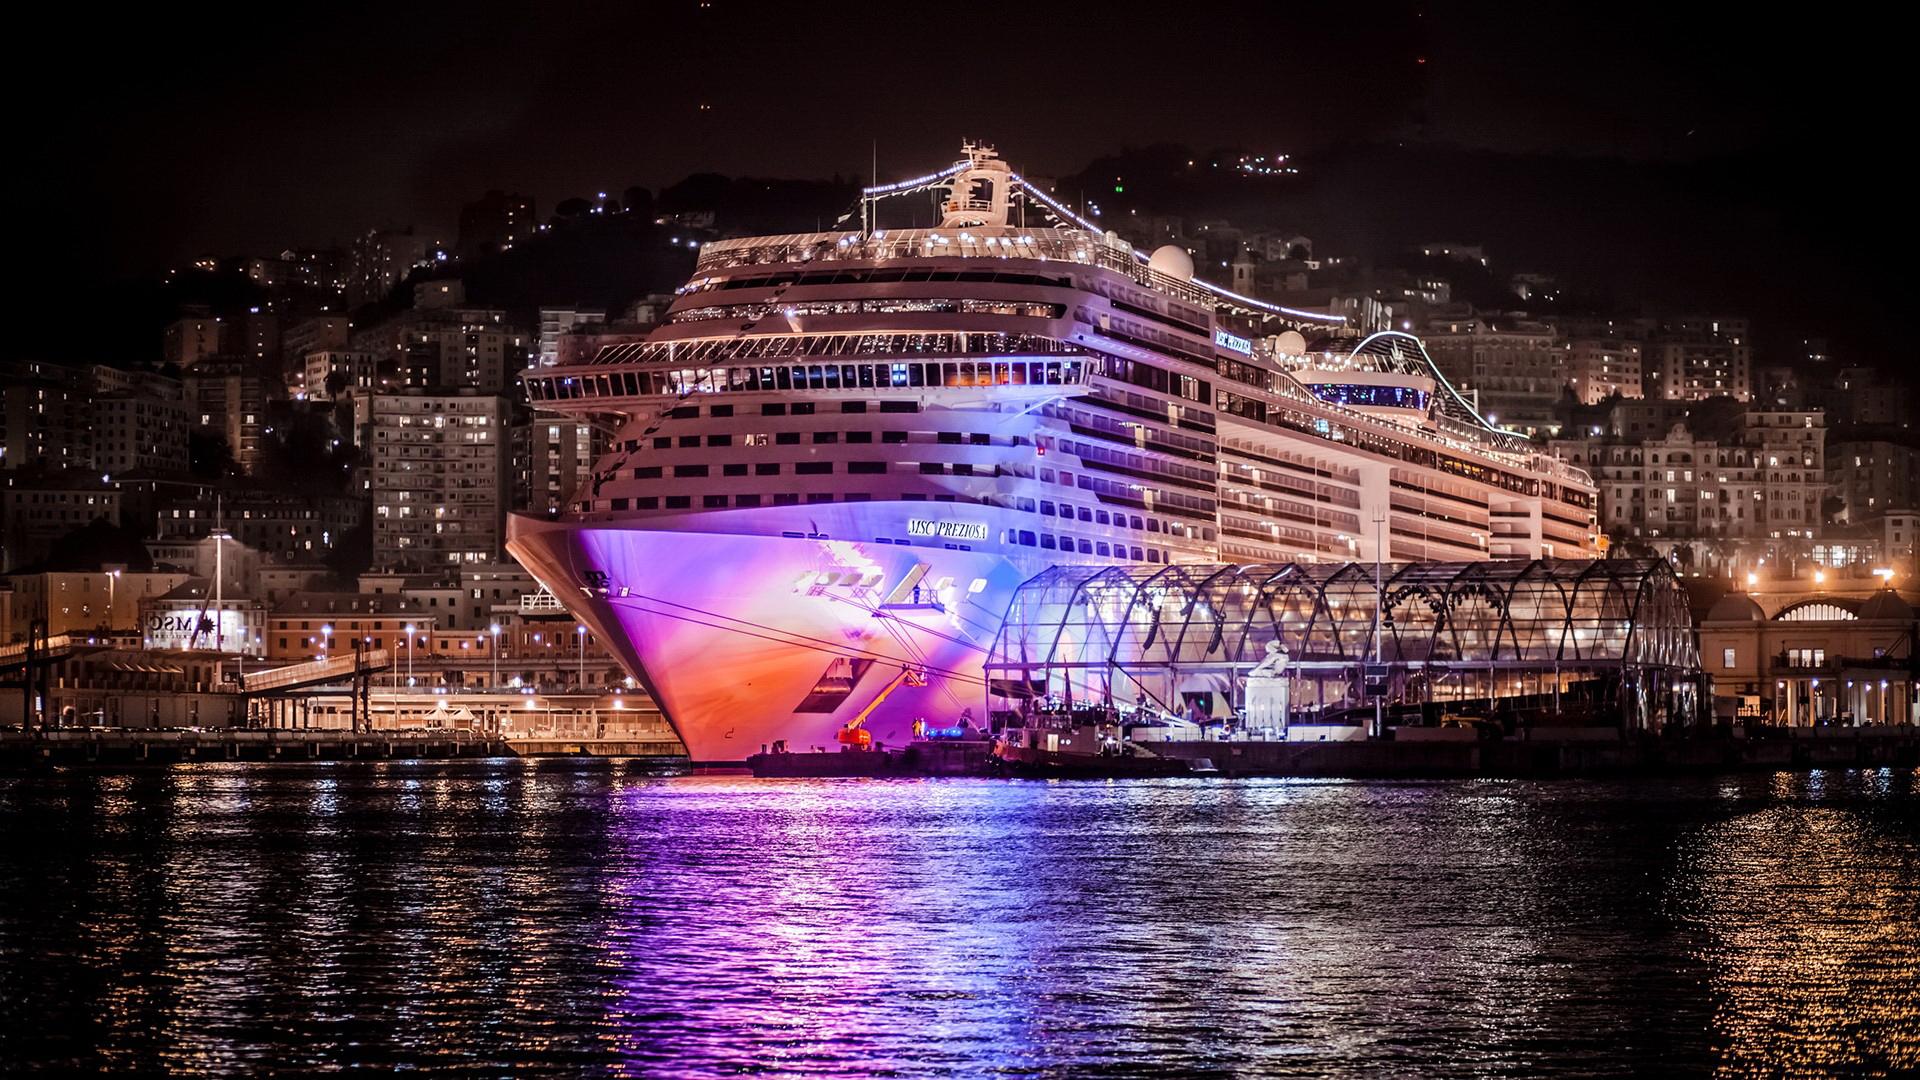 cruise ship wallpaper background - photo #21